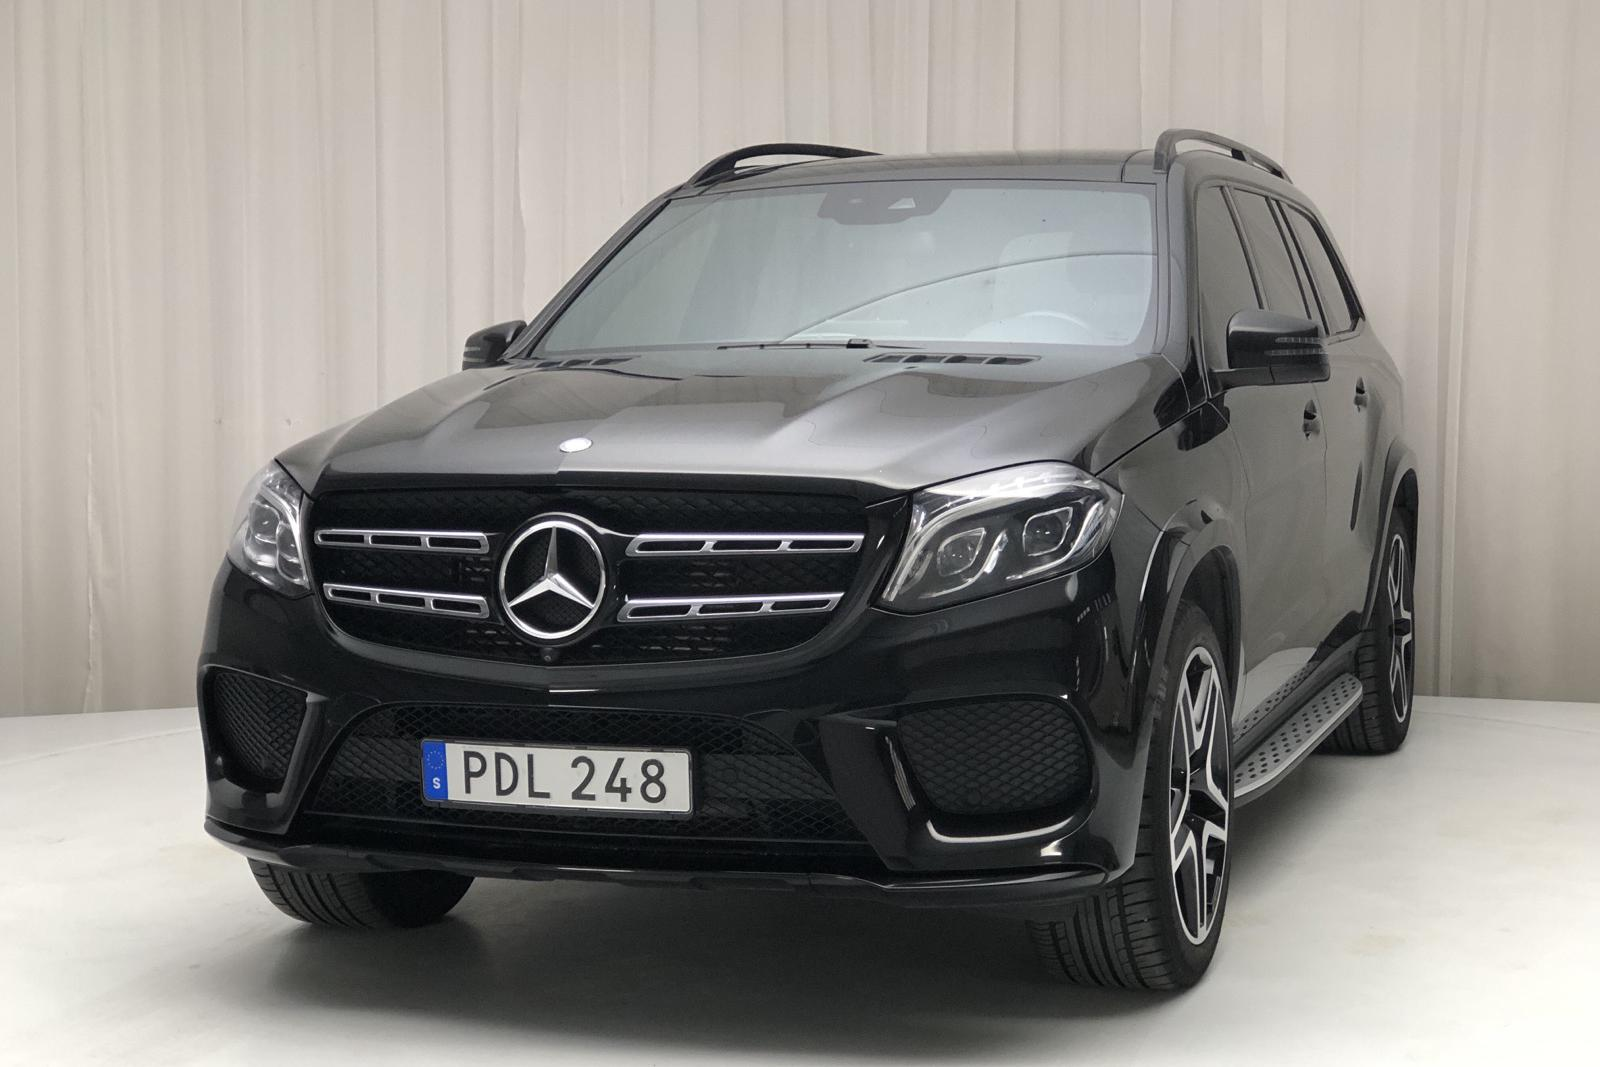 Mercedes GLS 350 d 4MATIC X166 (258hk) - 0 km - black - 2017